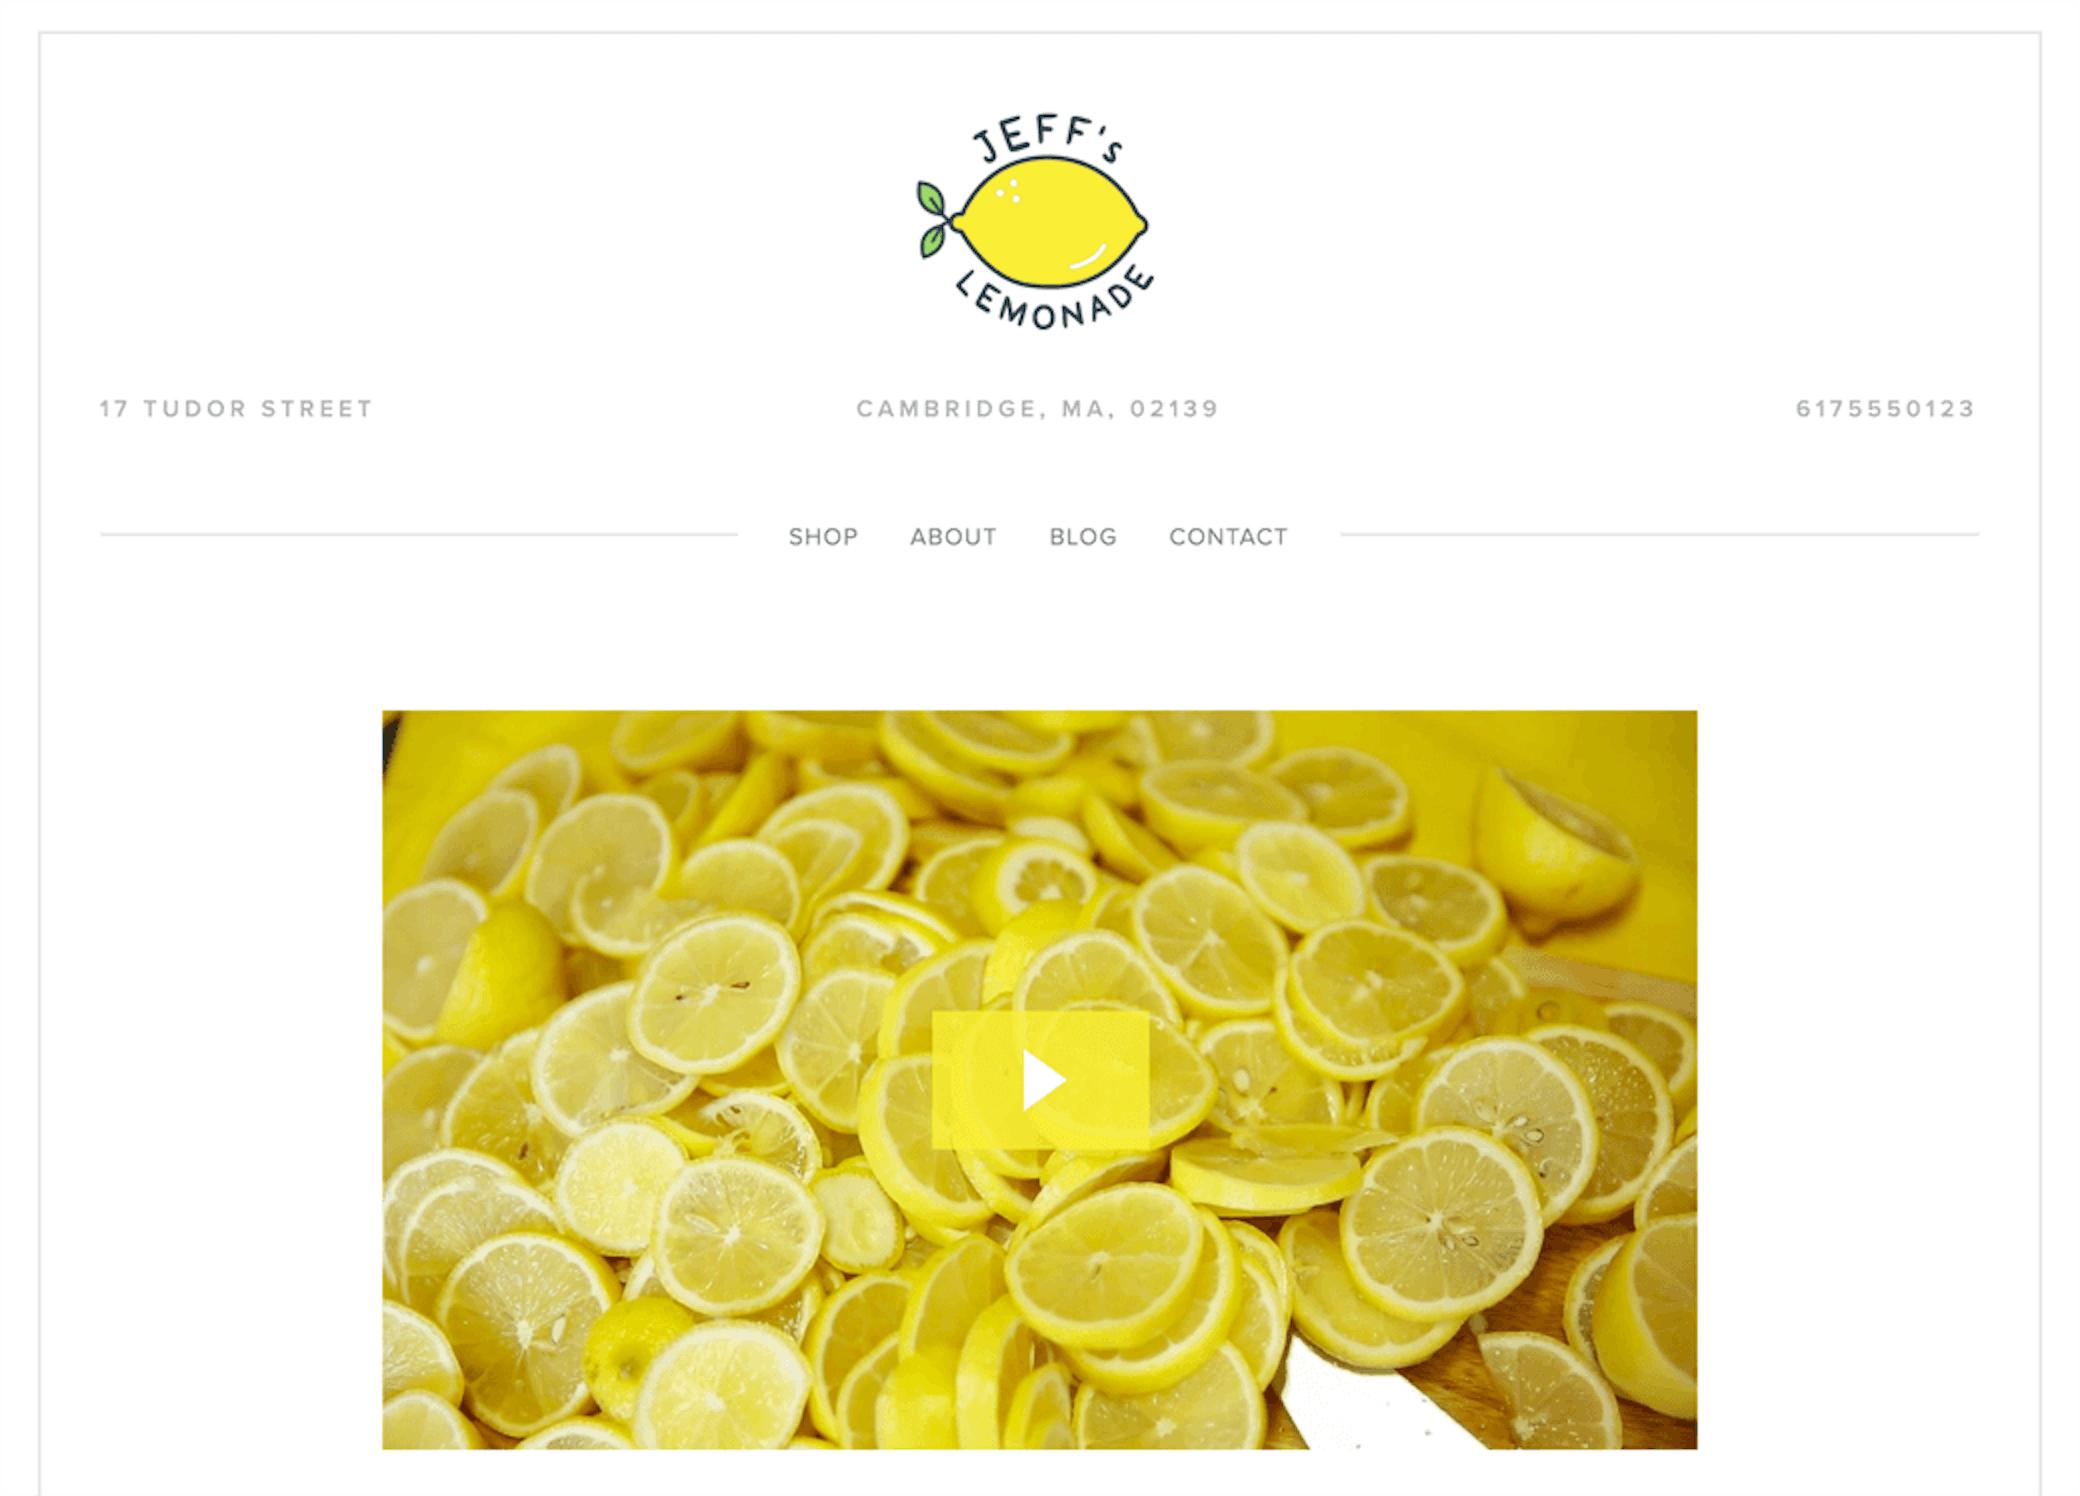 Jeffs Lemonade